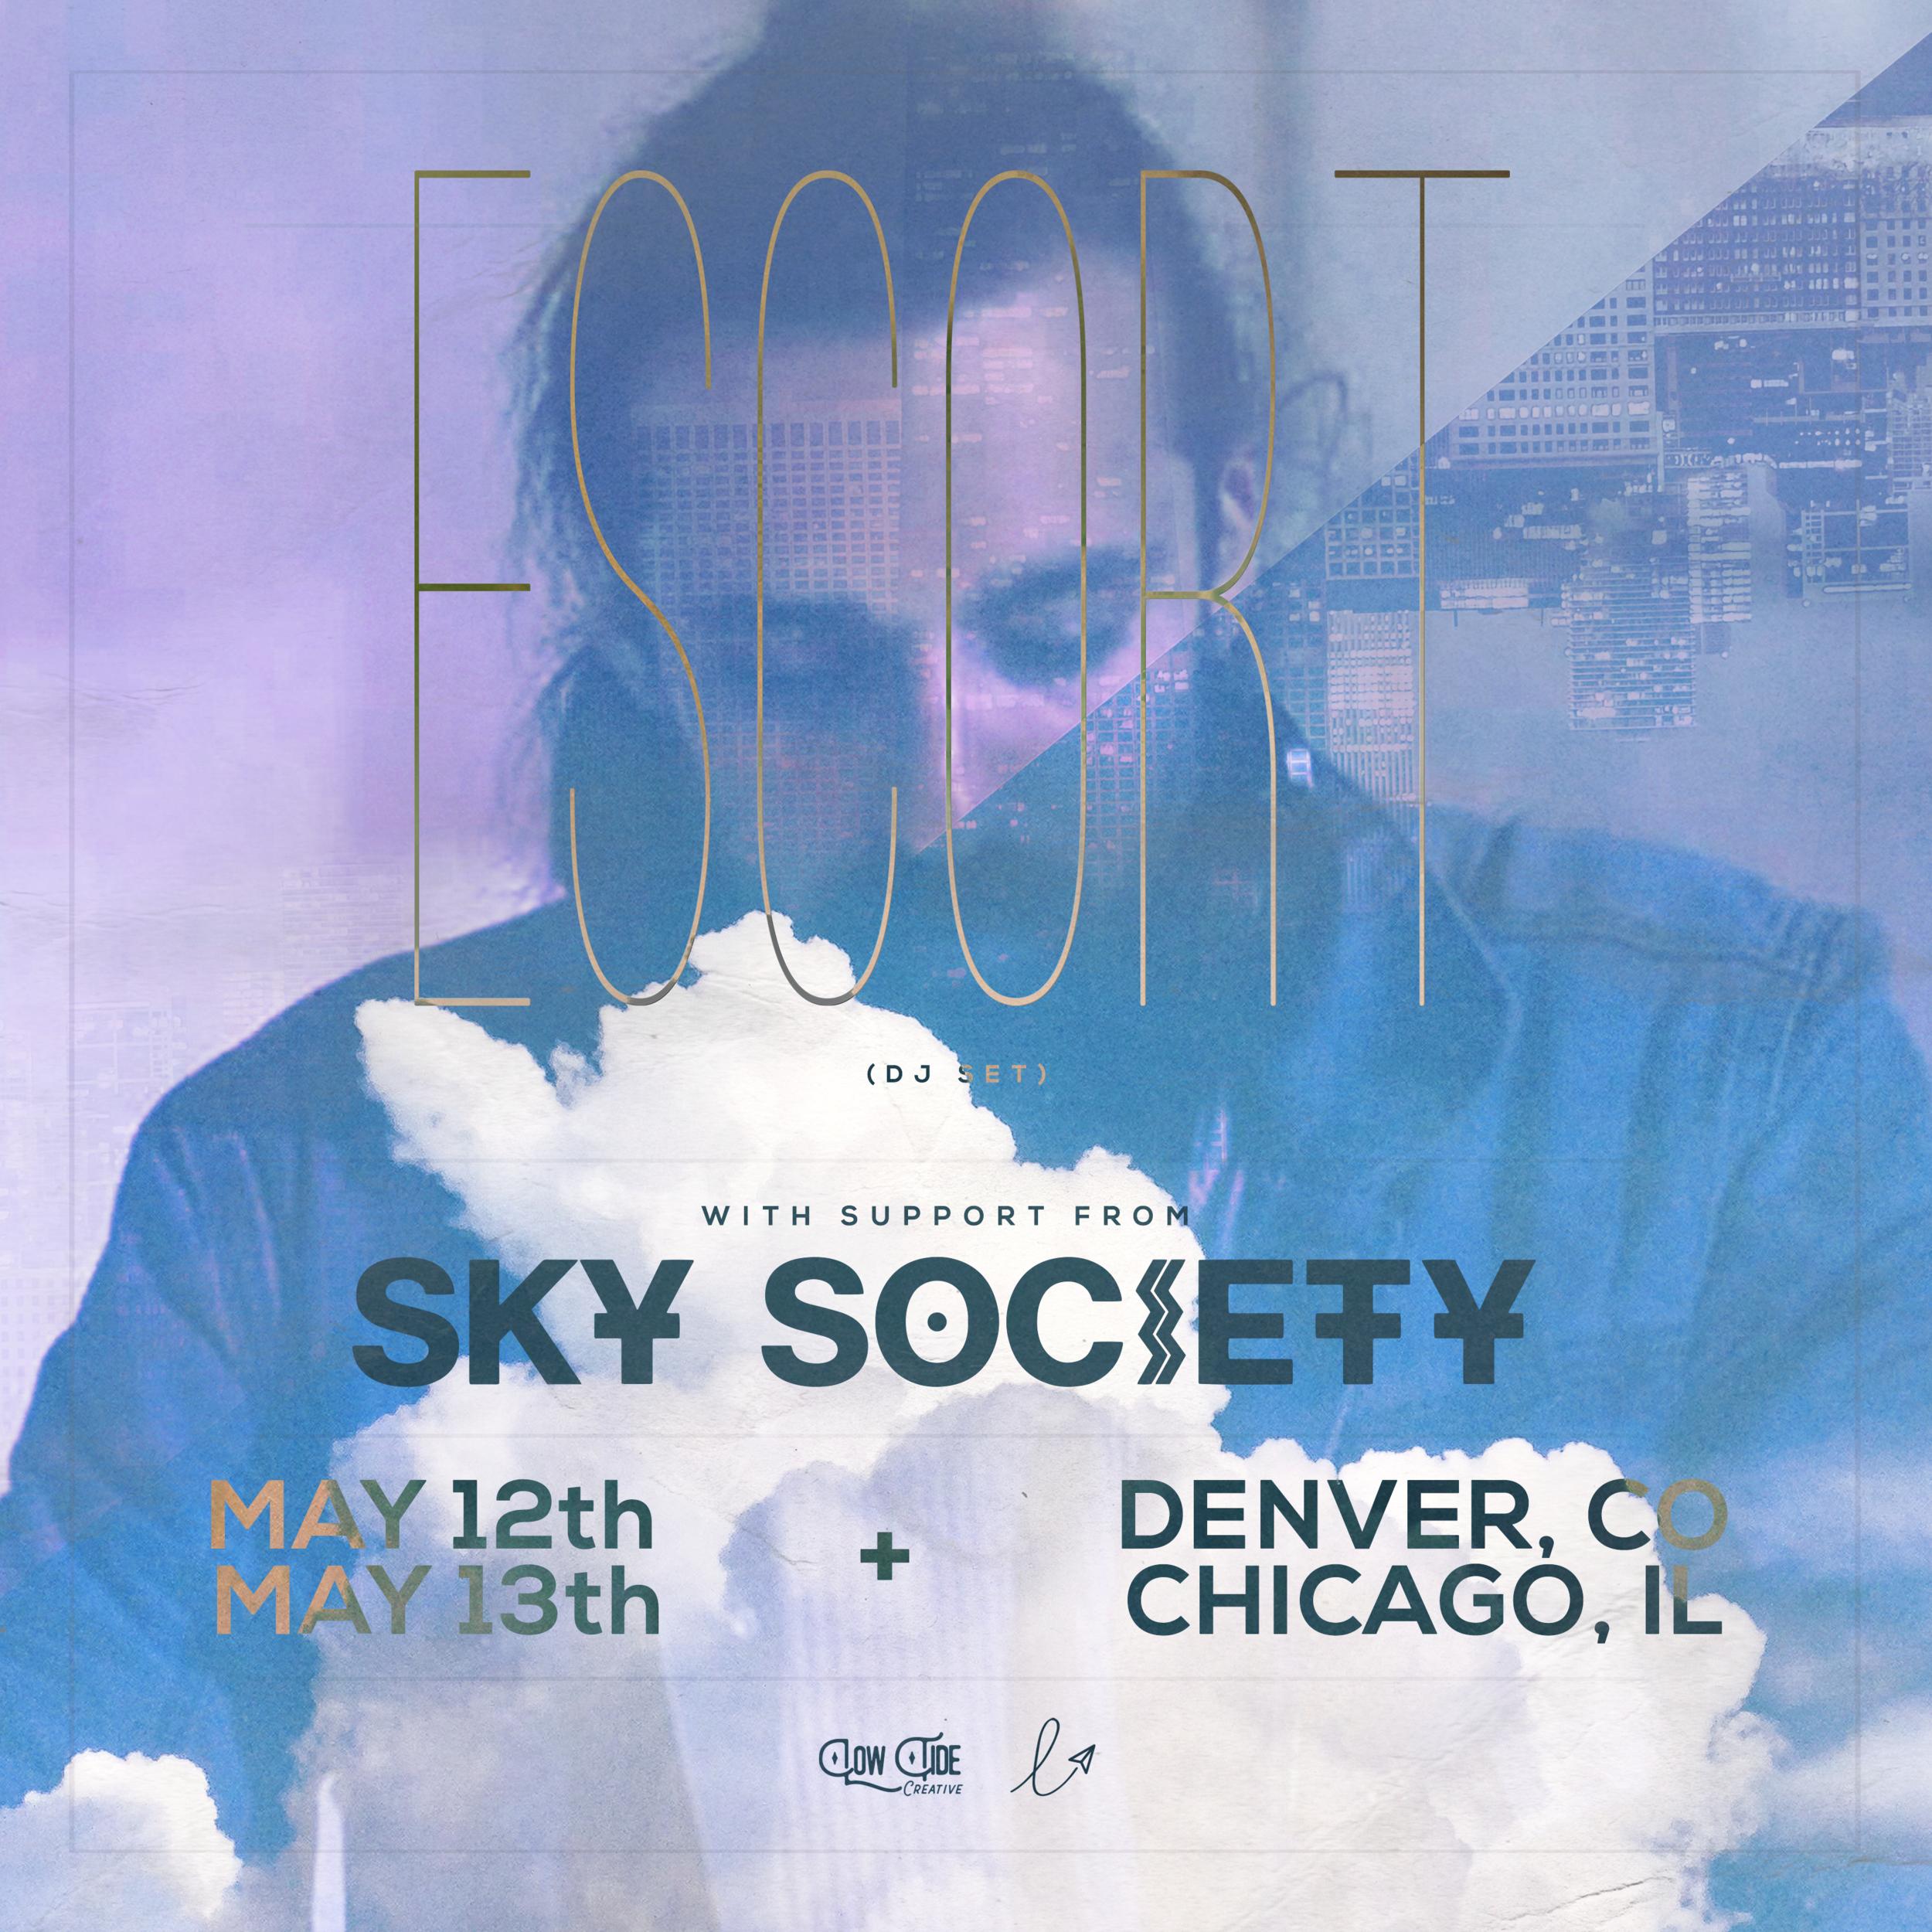 More Info Via Ticket Links Below ::  *** Denver 5/12 ::  http://bit.ly/EscortDenverPearls   *** Chicago 5/13 ::  http://bit.ly/EscortChi  Ayyyy, Lets get DeeP. <3